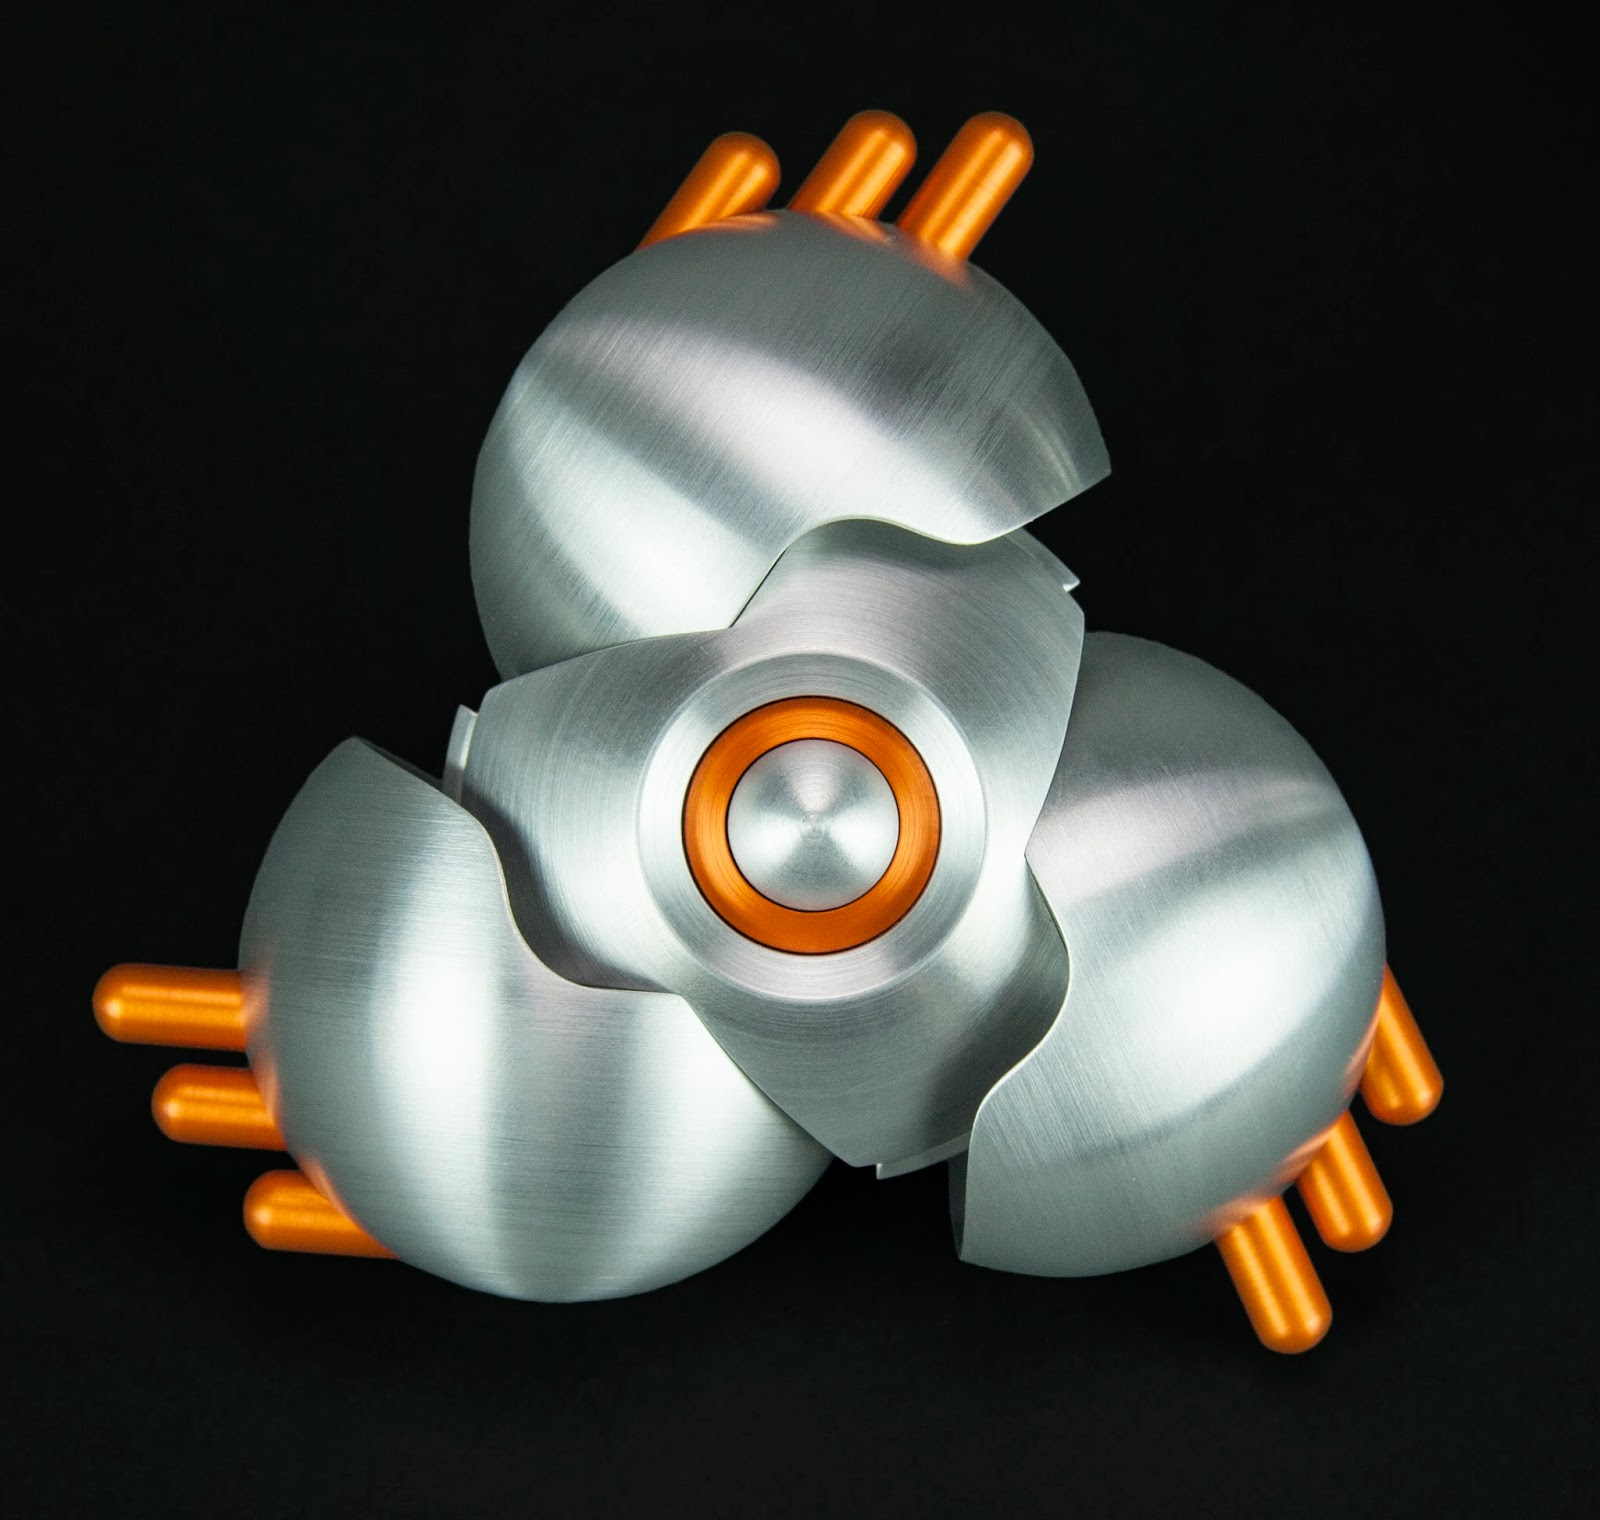 machine art, machined metal sculpture, Abstract metal art